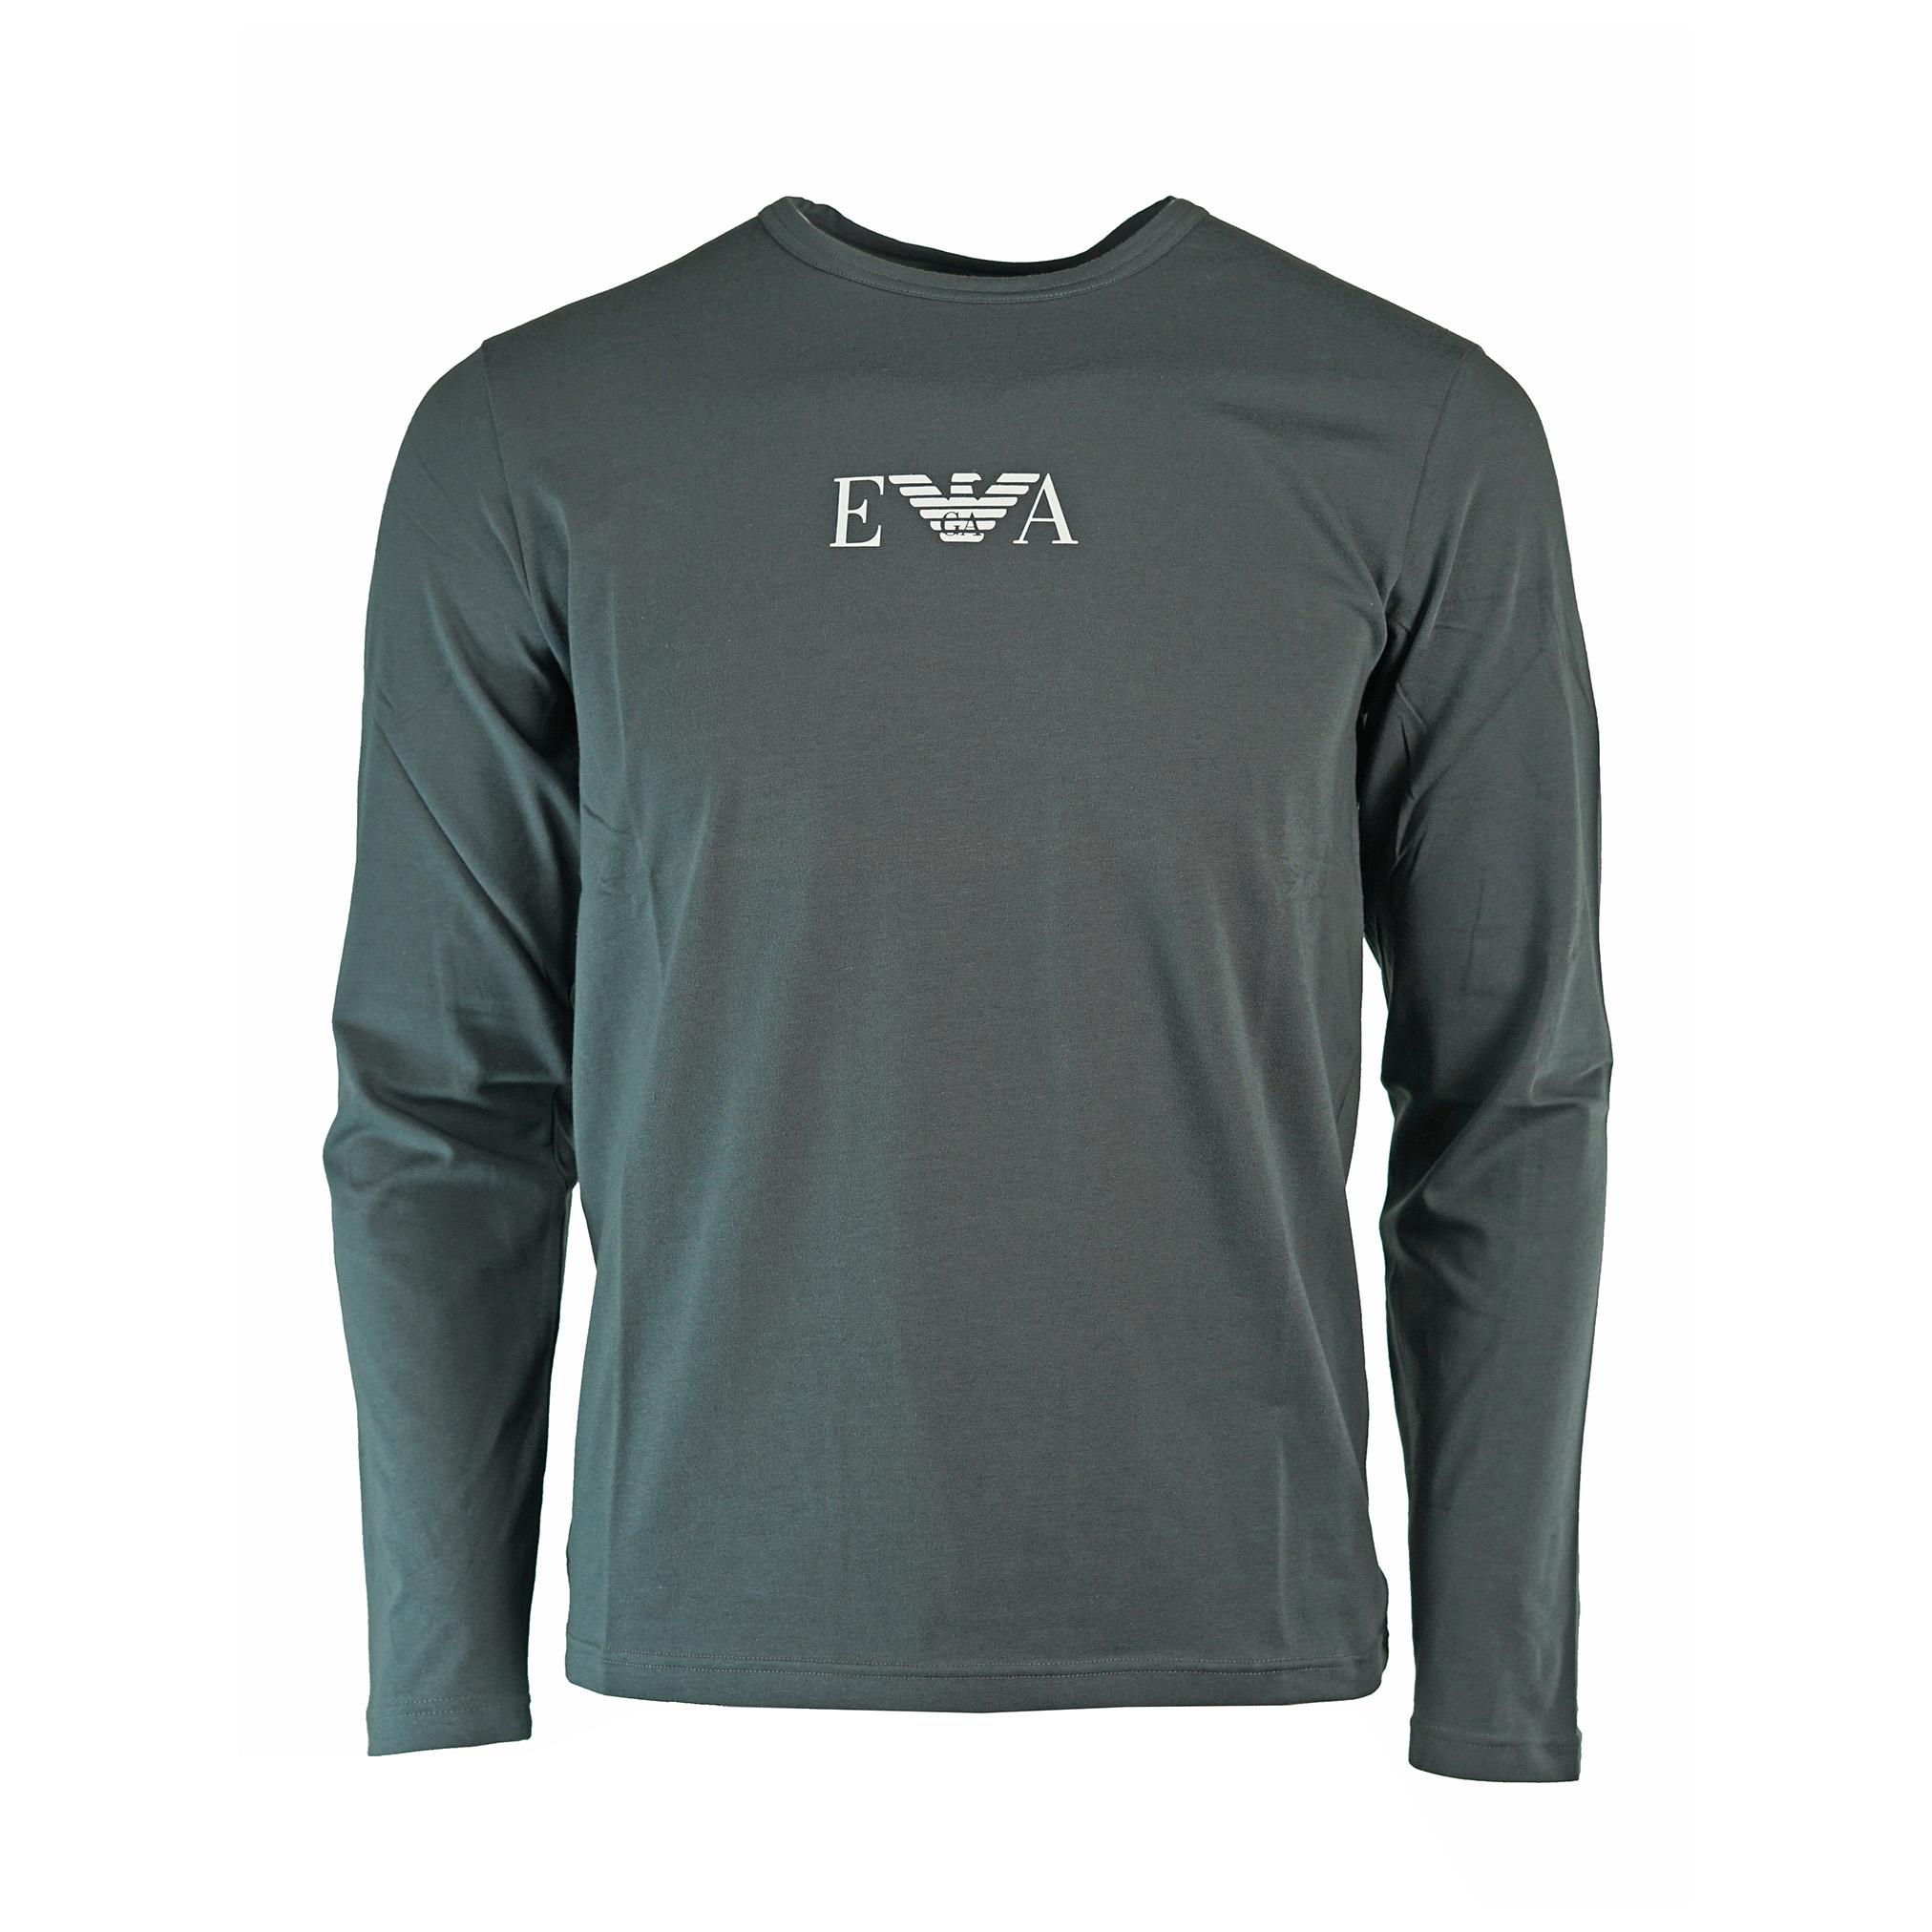 Emporio-Armani-111653-7A715-08444-T-Shirt